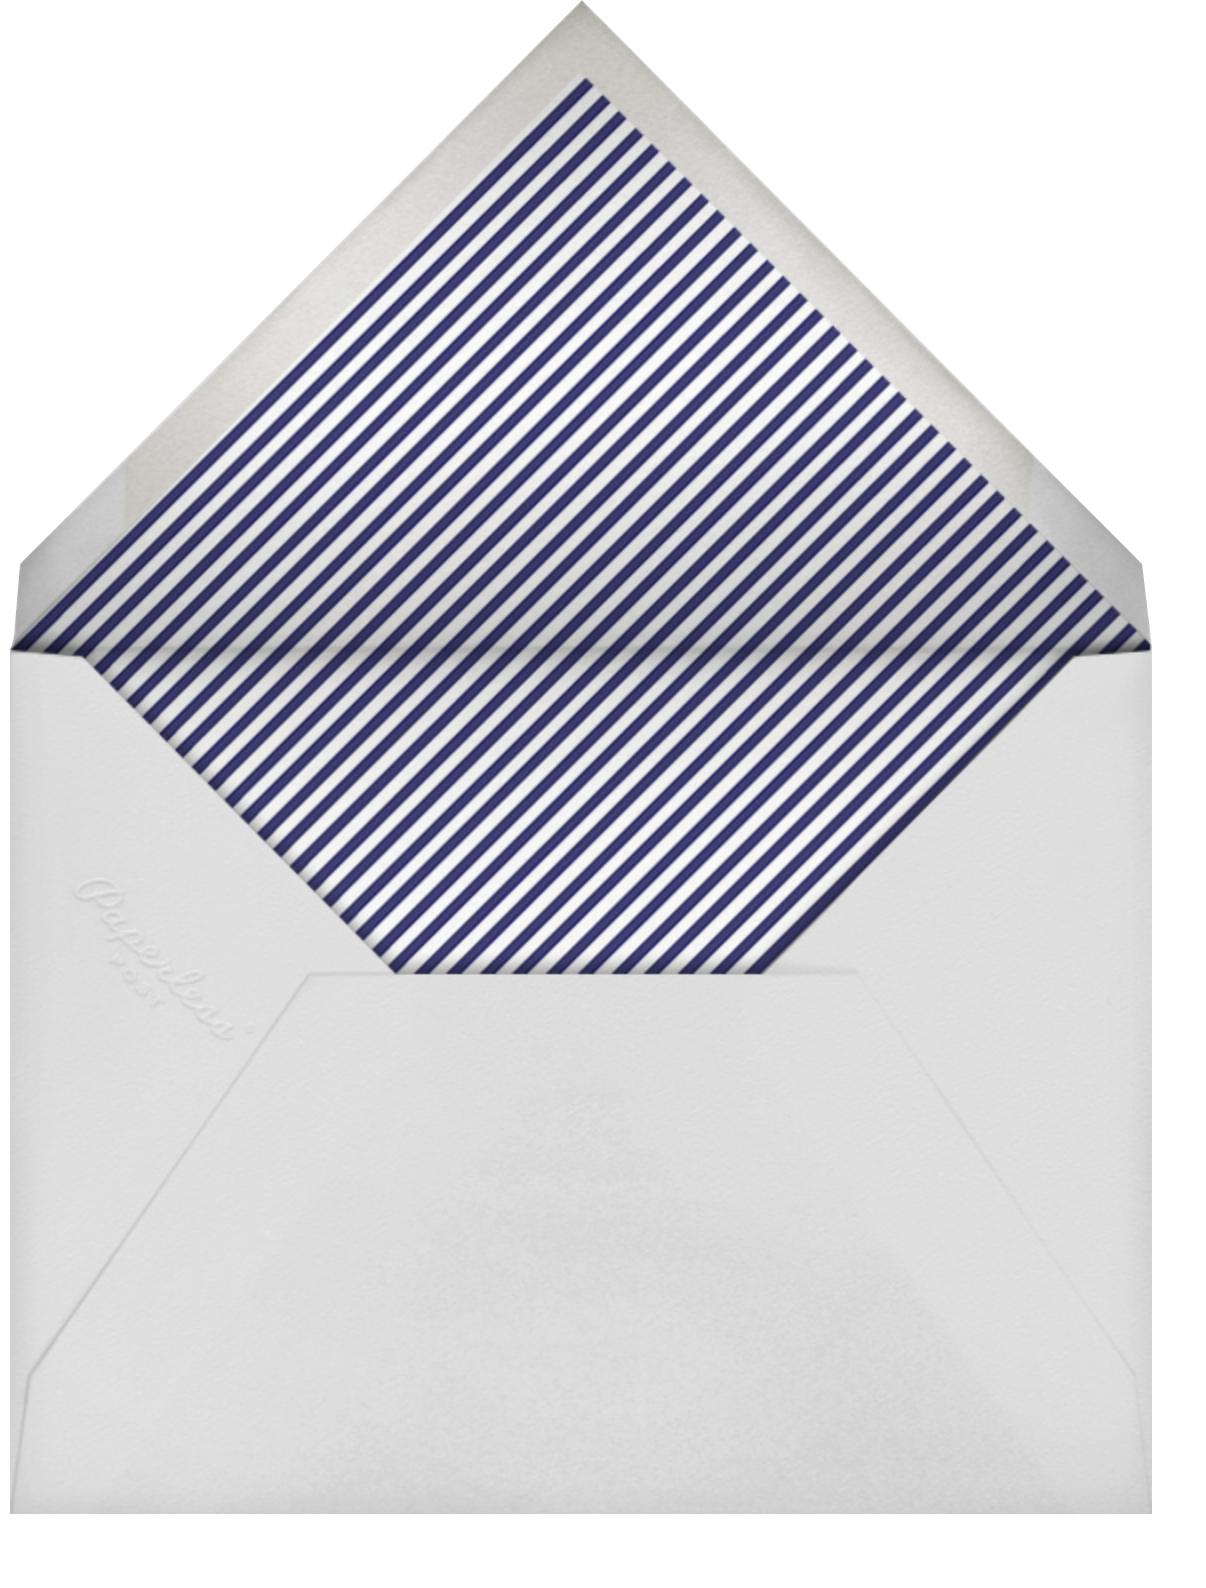 Hi Kittie - Royal Blue - Mr. Boddington's Studio - Envelope